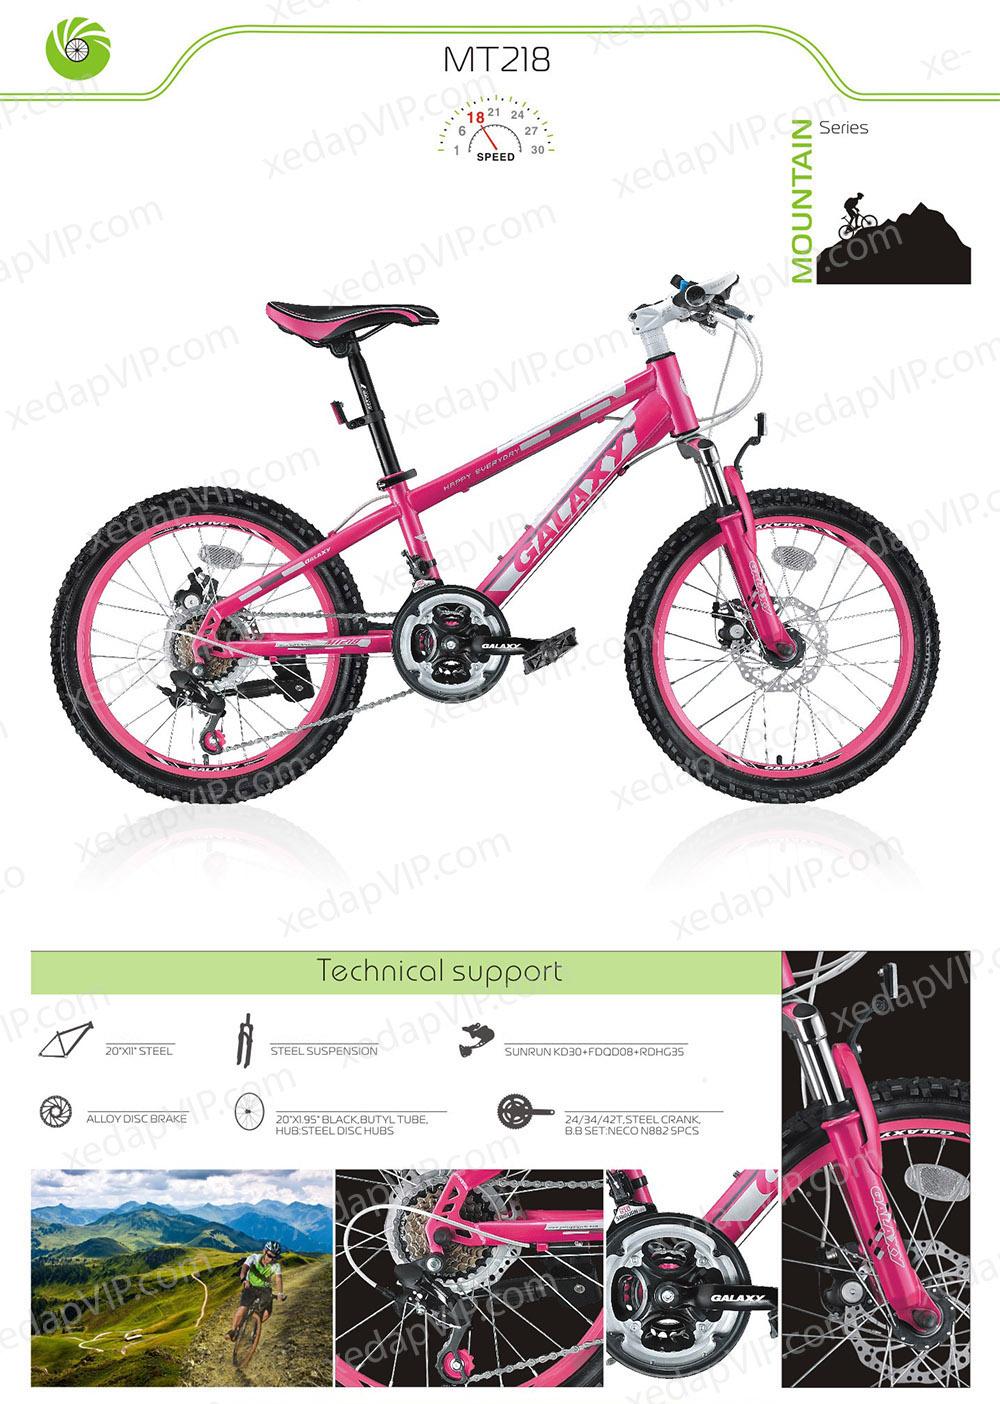 Xe dap the thao tre em GALAXY MT218, xe dap the thao, xe dap trinx, xe đạp thể thao chính hãng, xe dap asama, mt218